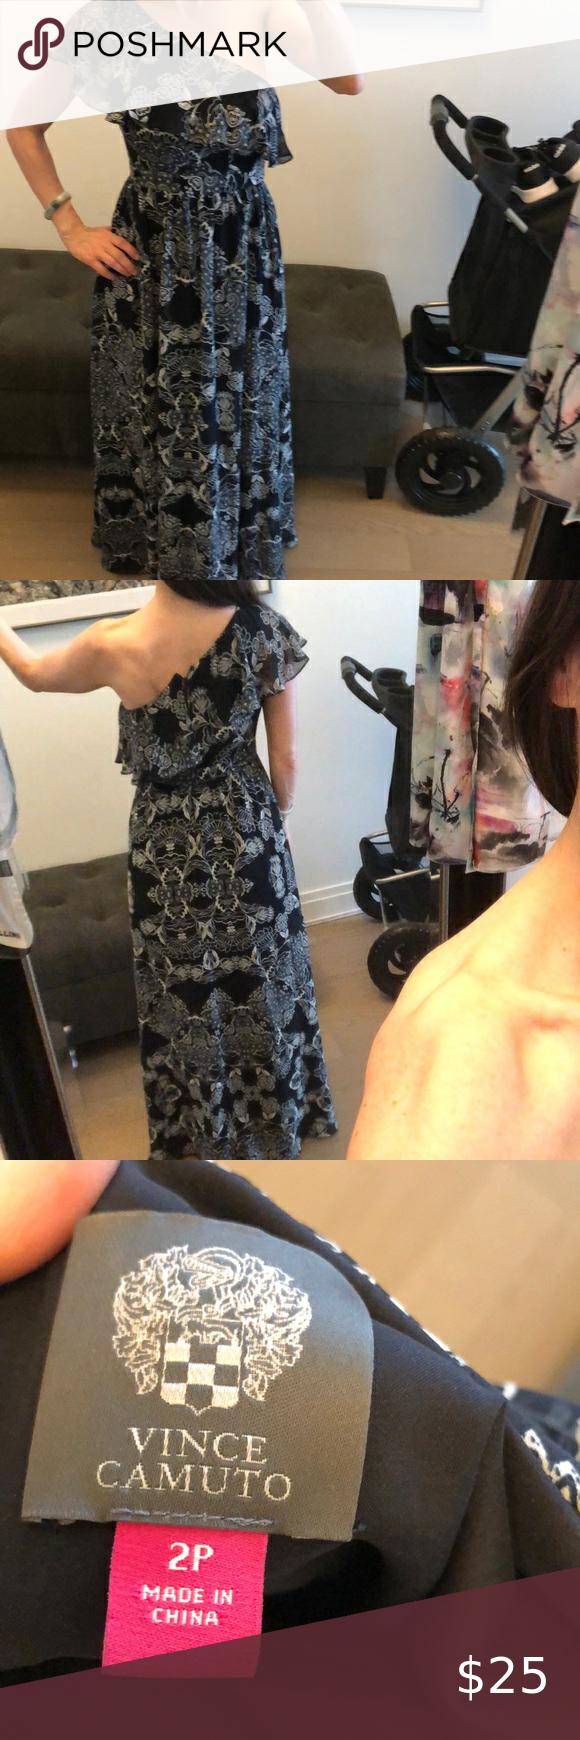 Vince Camuto Maxi Dress Size 2p Navy Blue White Maxi Dress Dresses Shoulder Maxi Dress [ 1740 x 580 Pixel ]